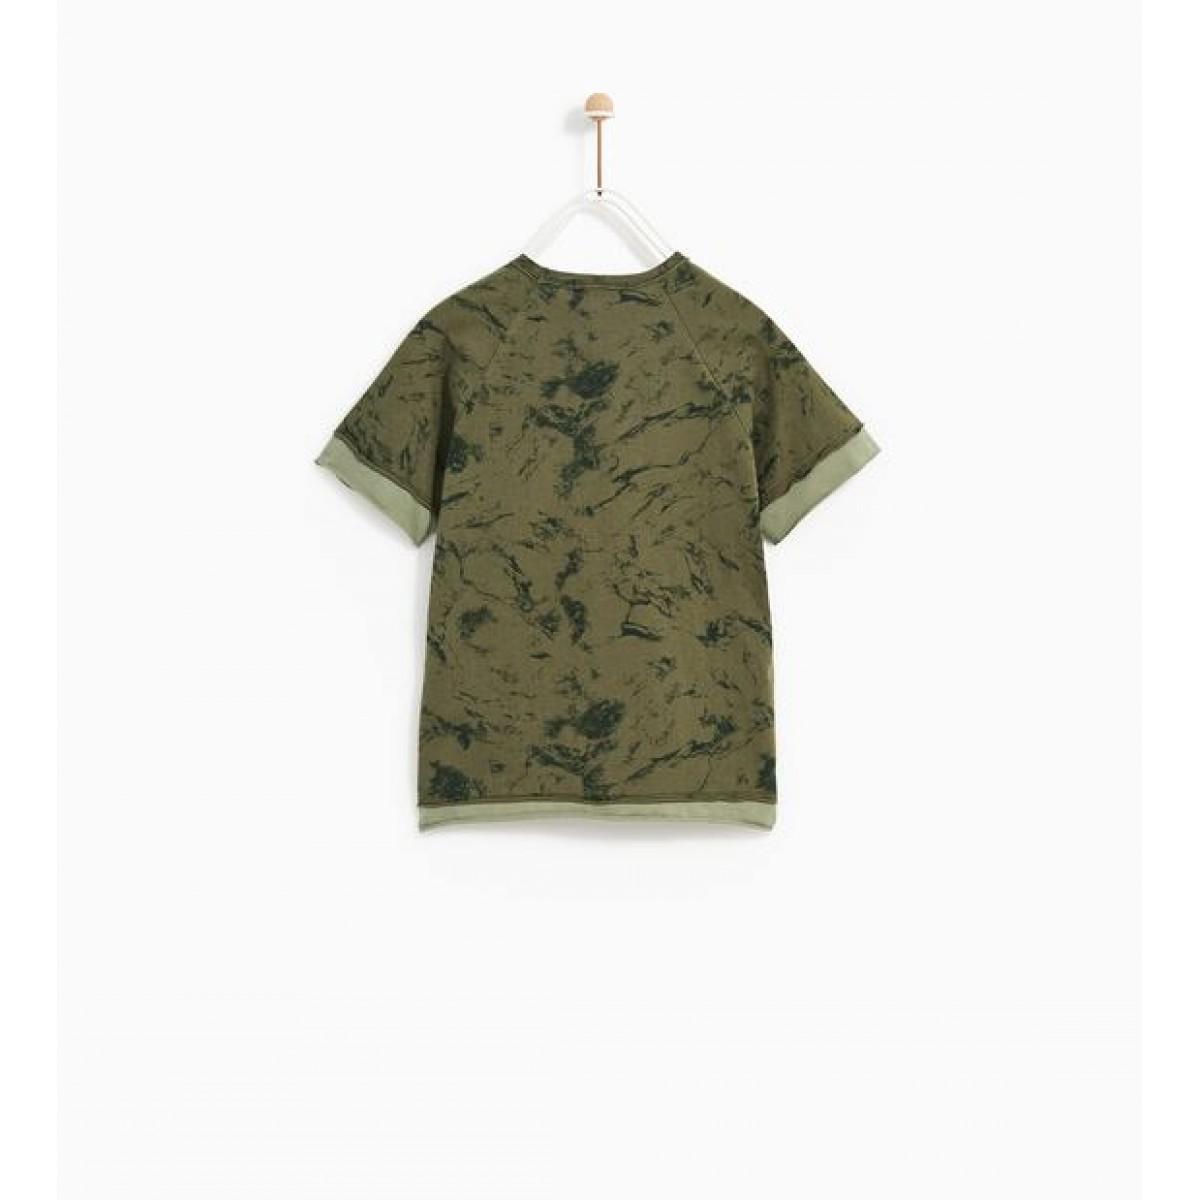 Zara Camouflage Slogan T-Shirt